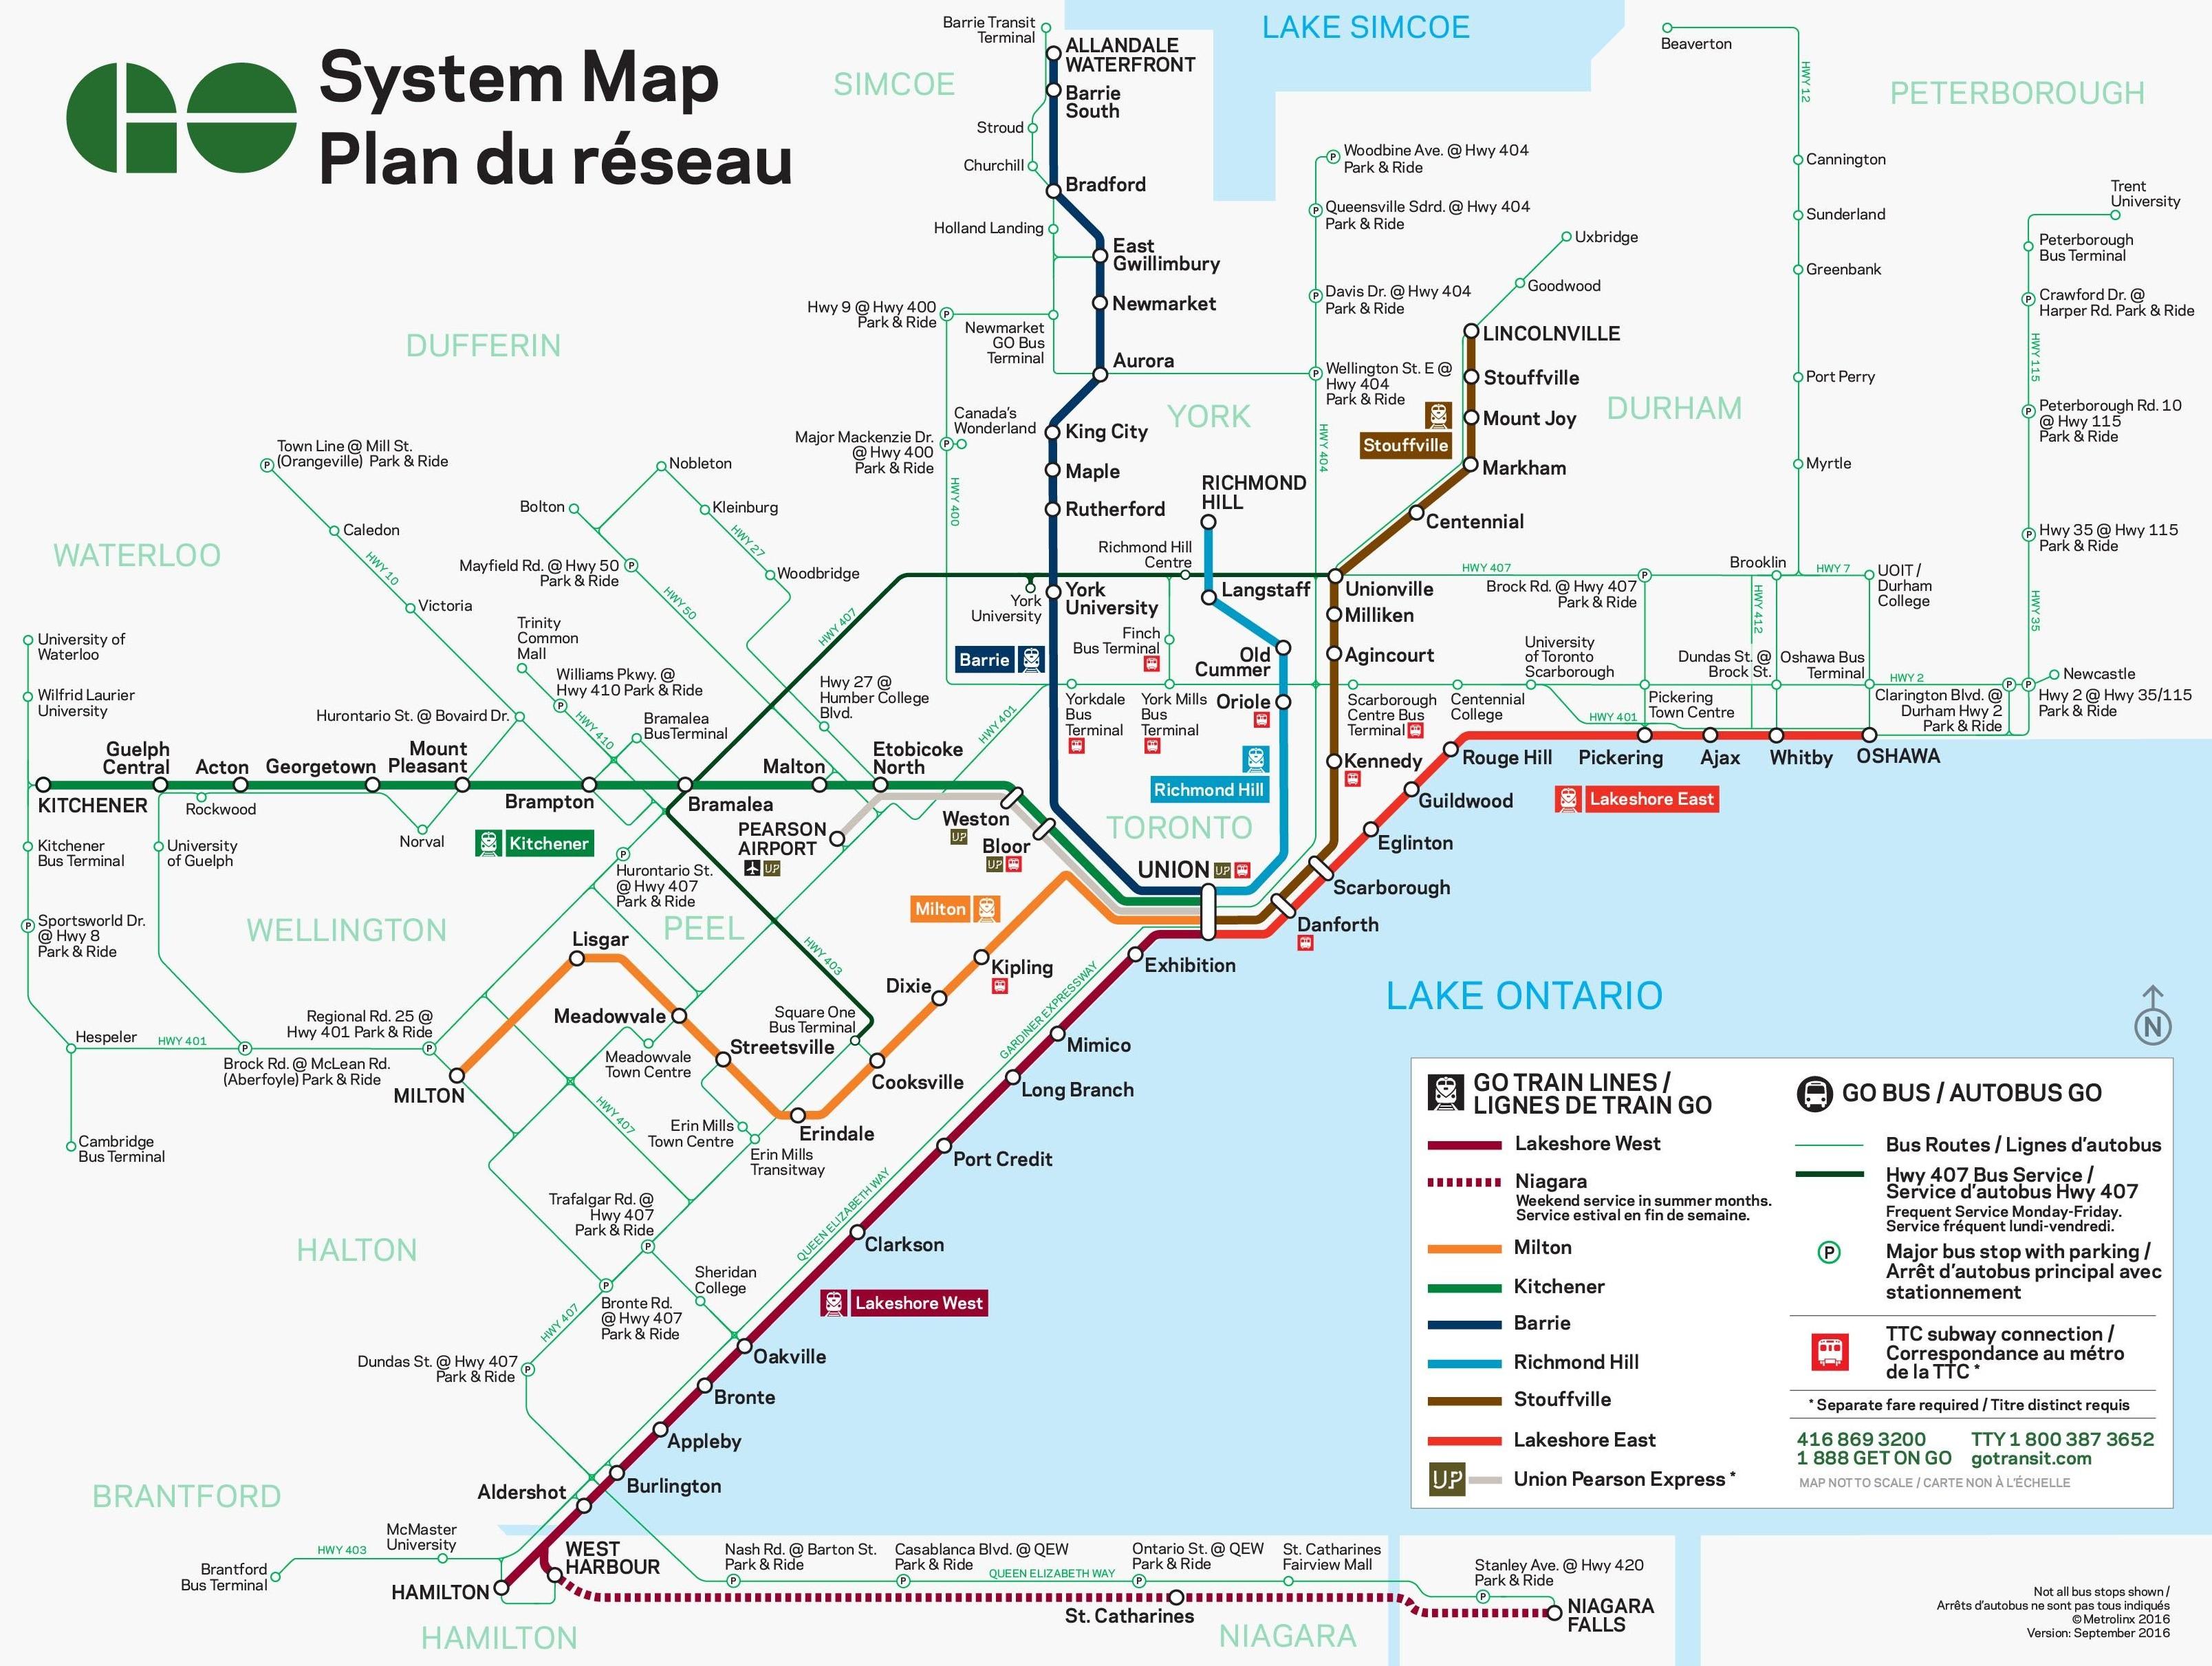 Toronto Train Map Toronto train and bus map Toronto Train Map